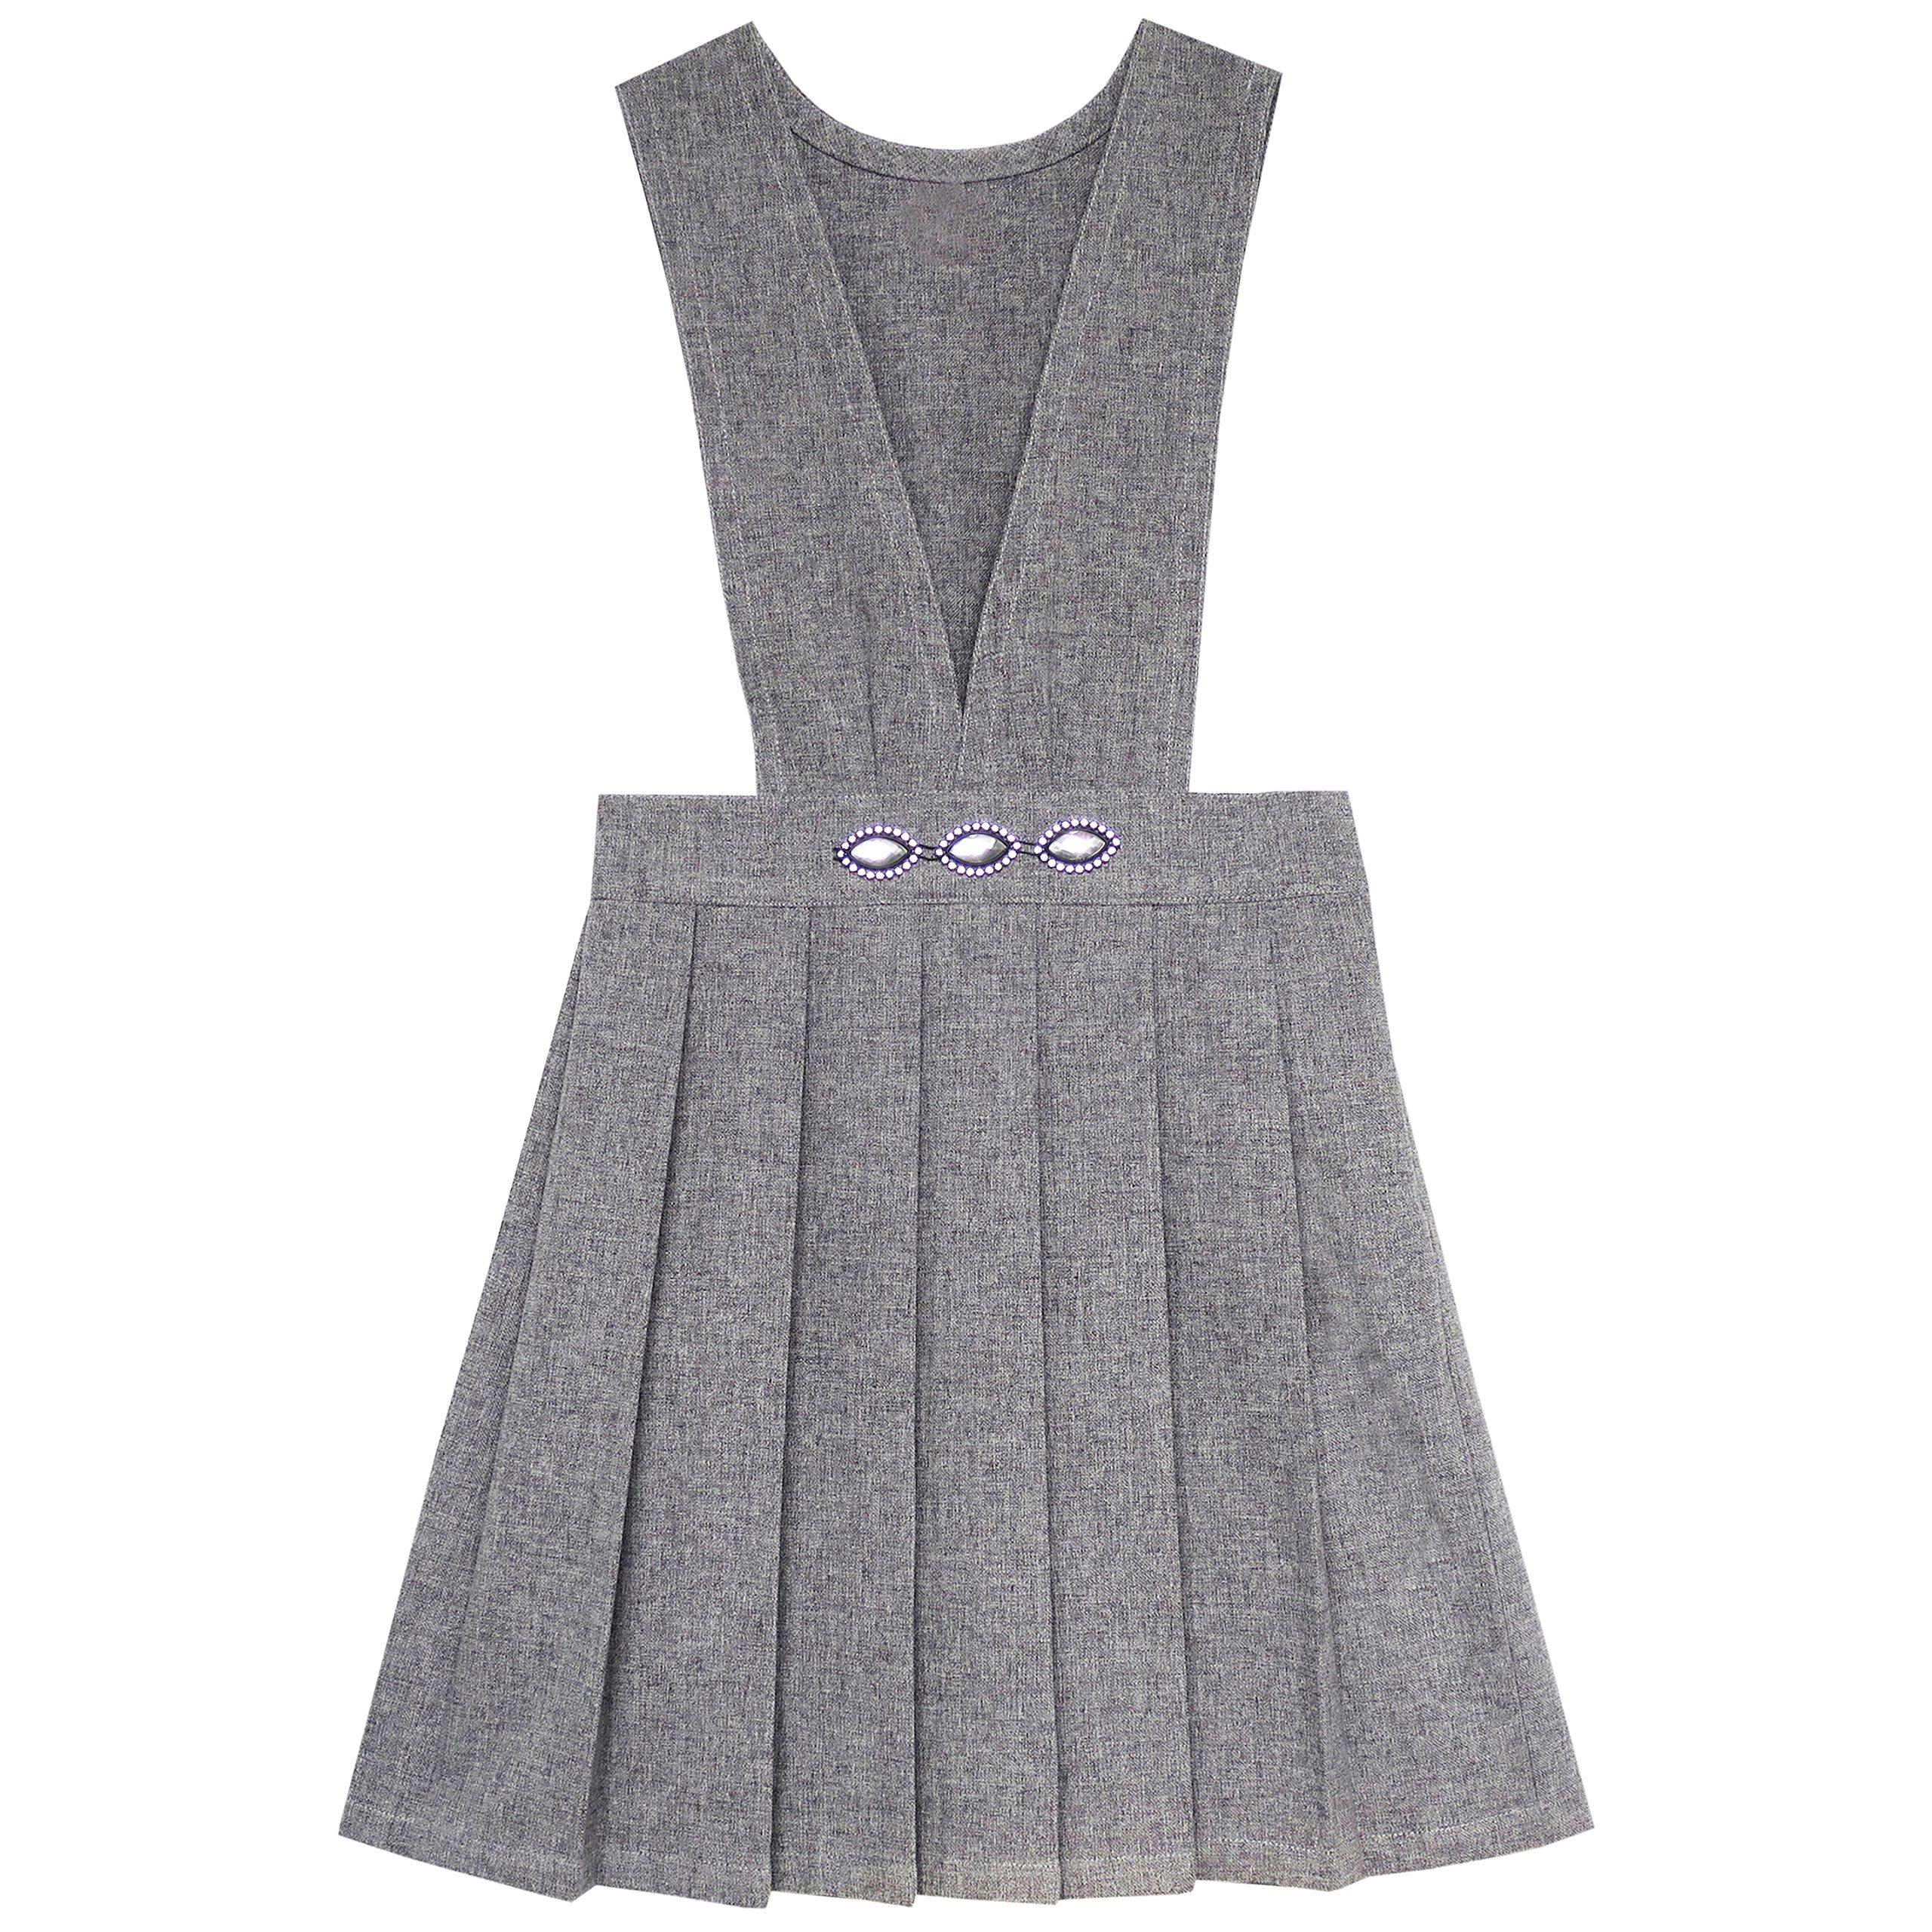 Sunny Fashion JX93 Girls Dress V Neck Pleated Hem School Size 8